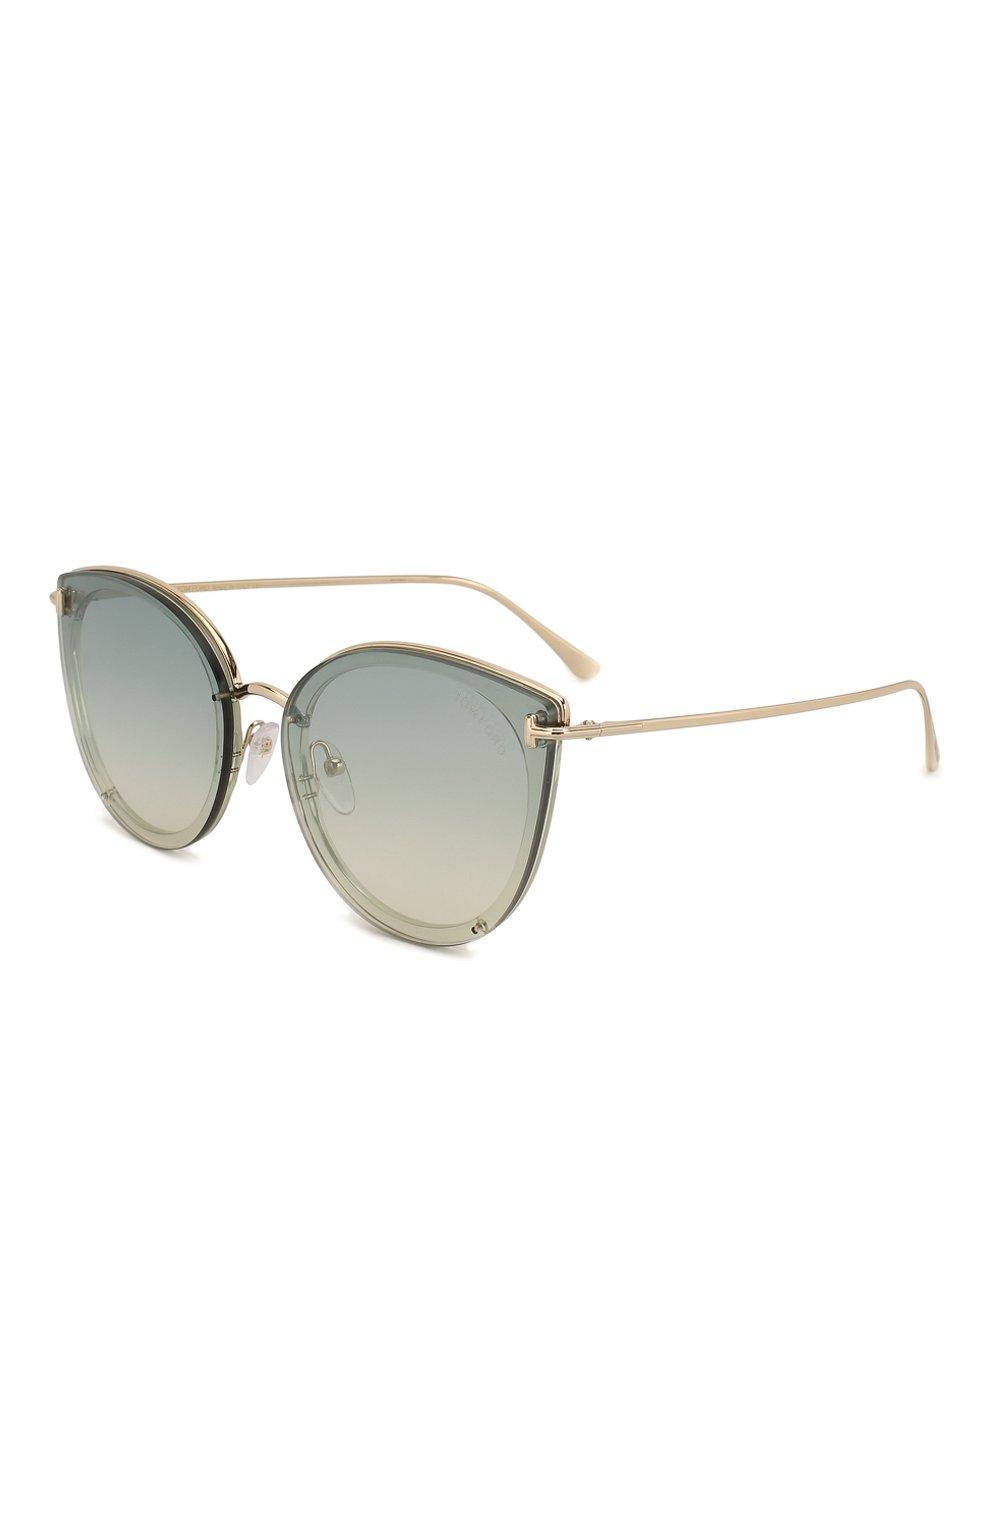 Женские солнцезащитные очки TOM FORD голубого цвета, арт. TF720-K 32Q | Фото 1